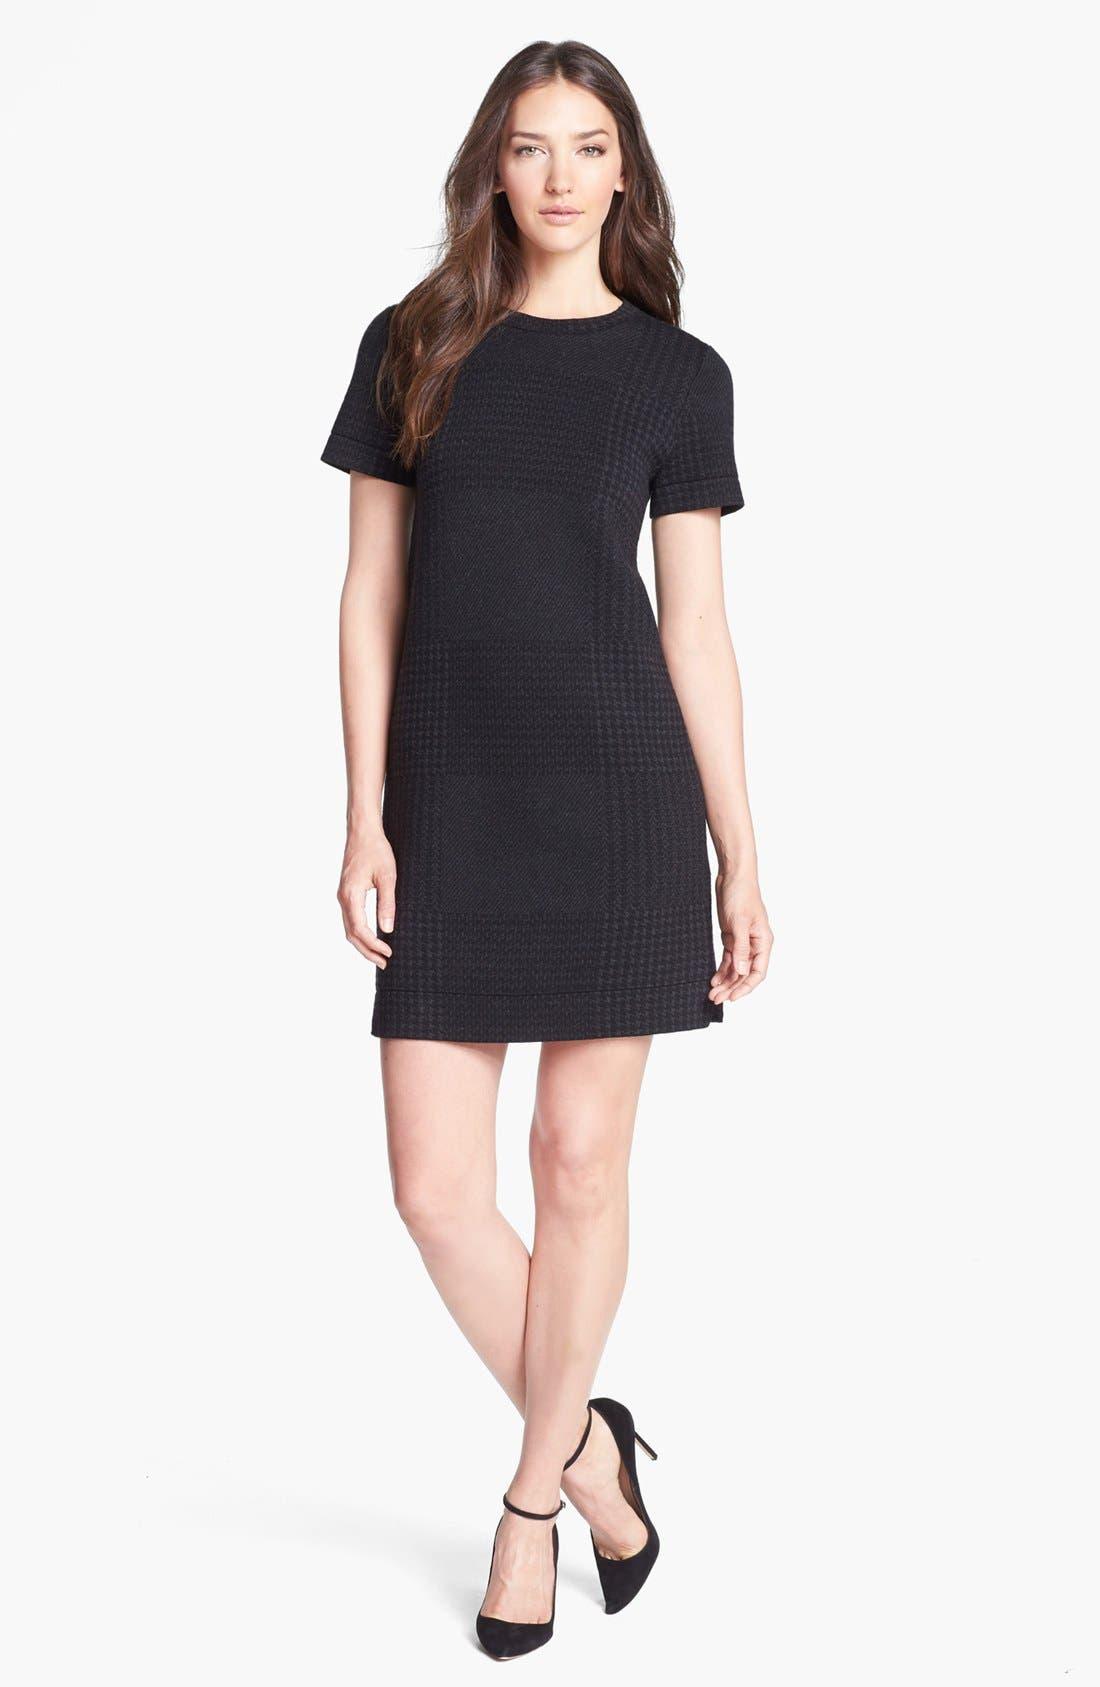 Main Image - Theory 'Darmelle' Wool Blend A-Line Dress